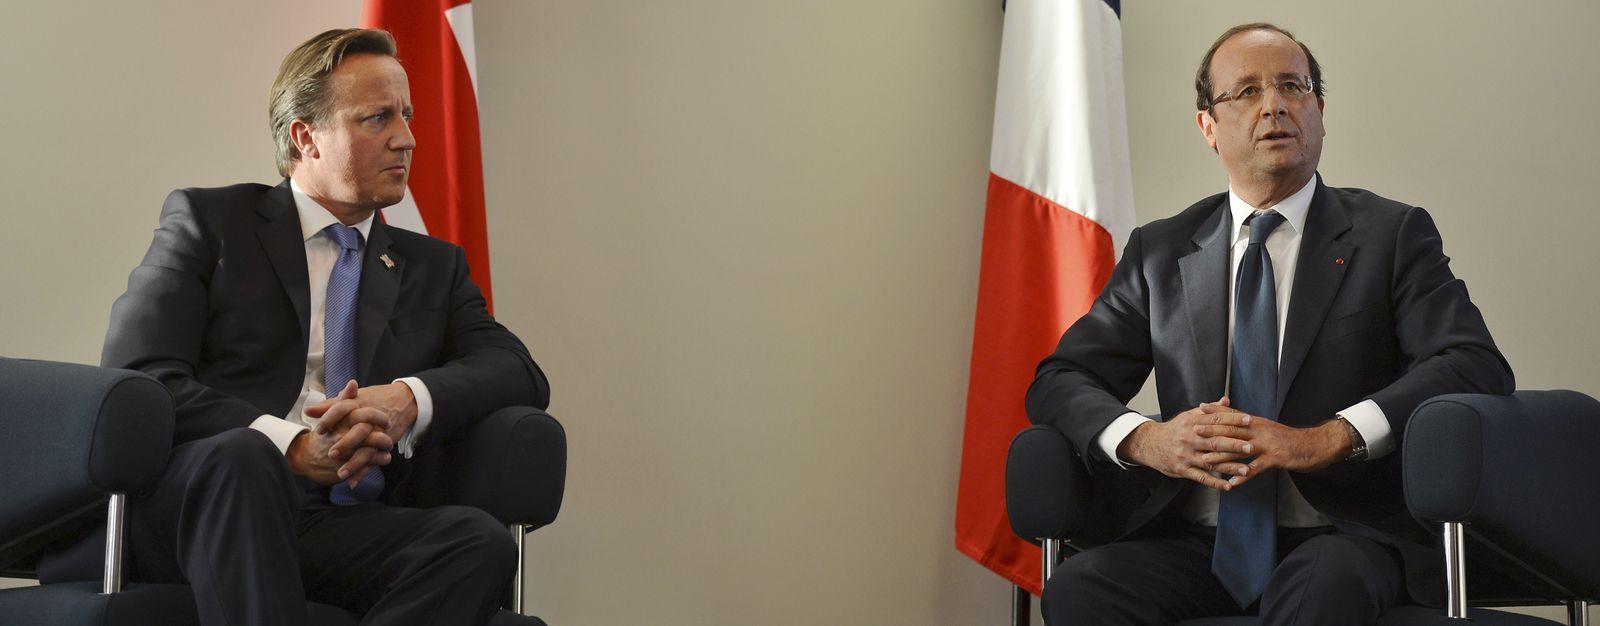 Cameron / Hollande XXL